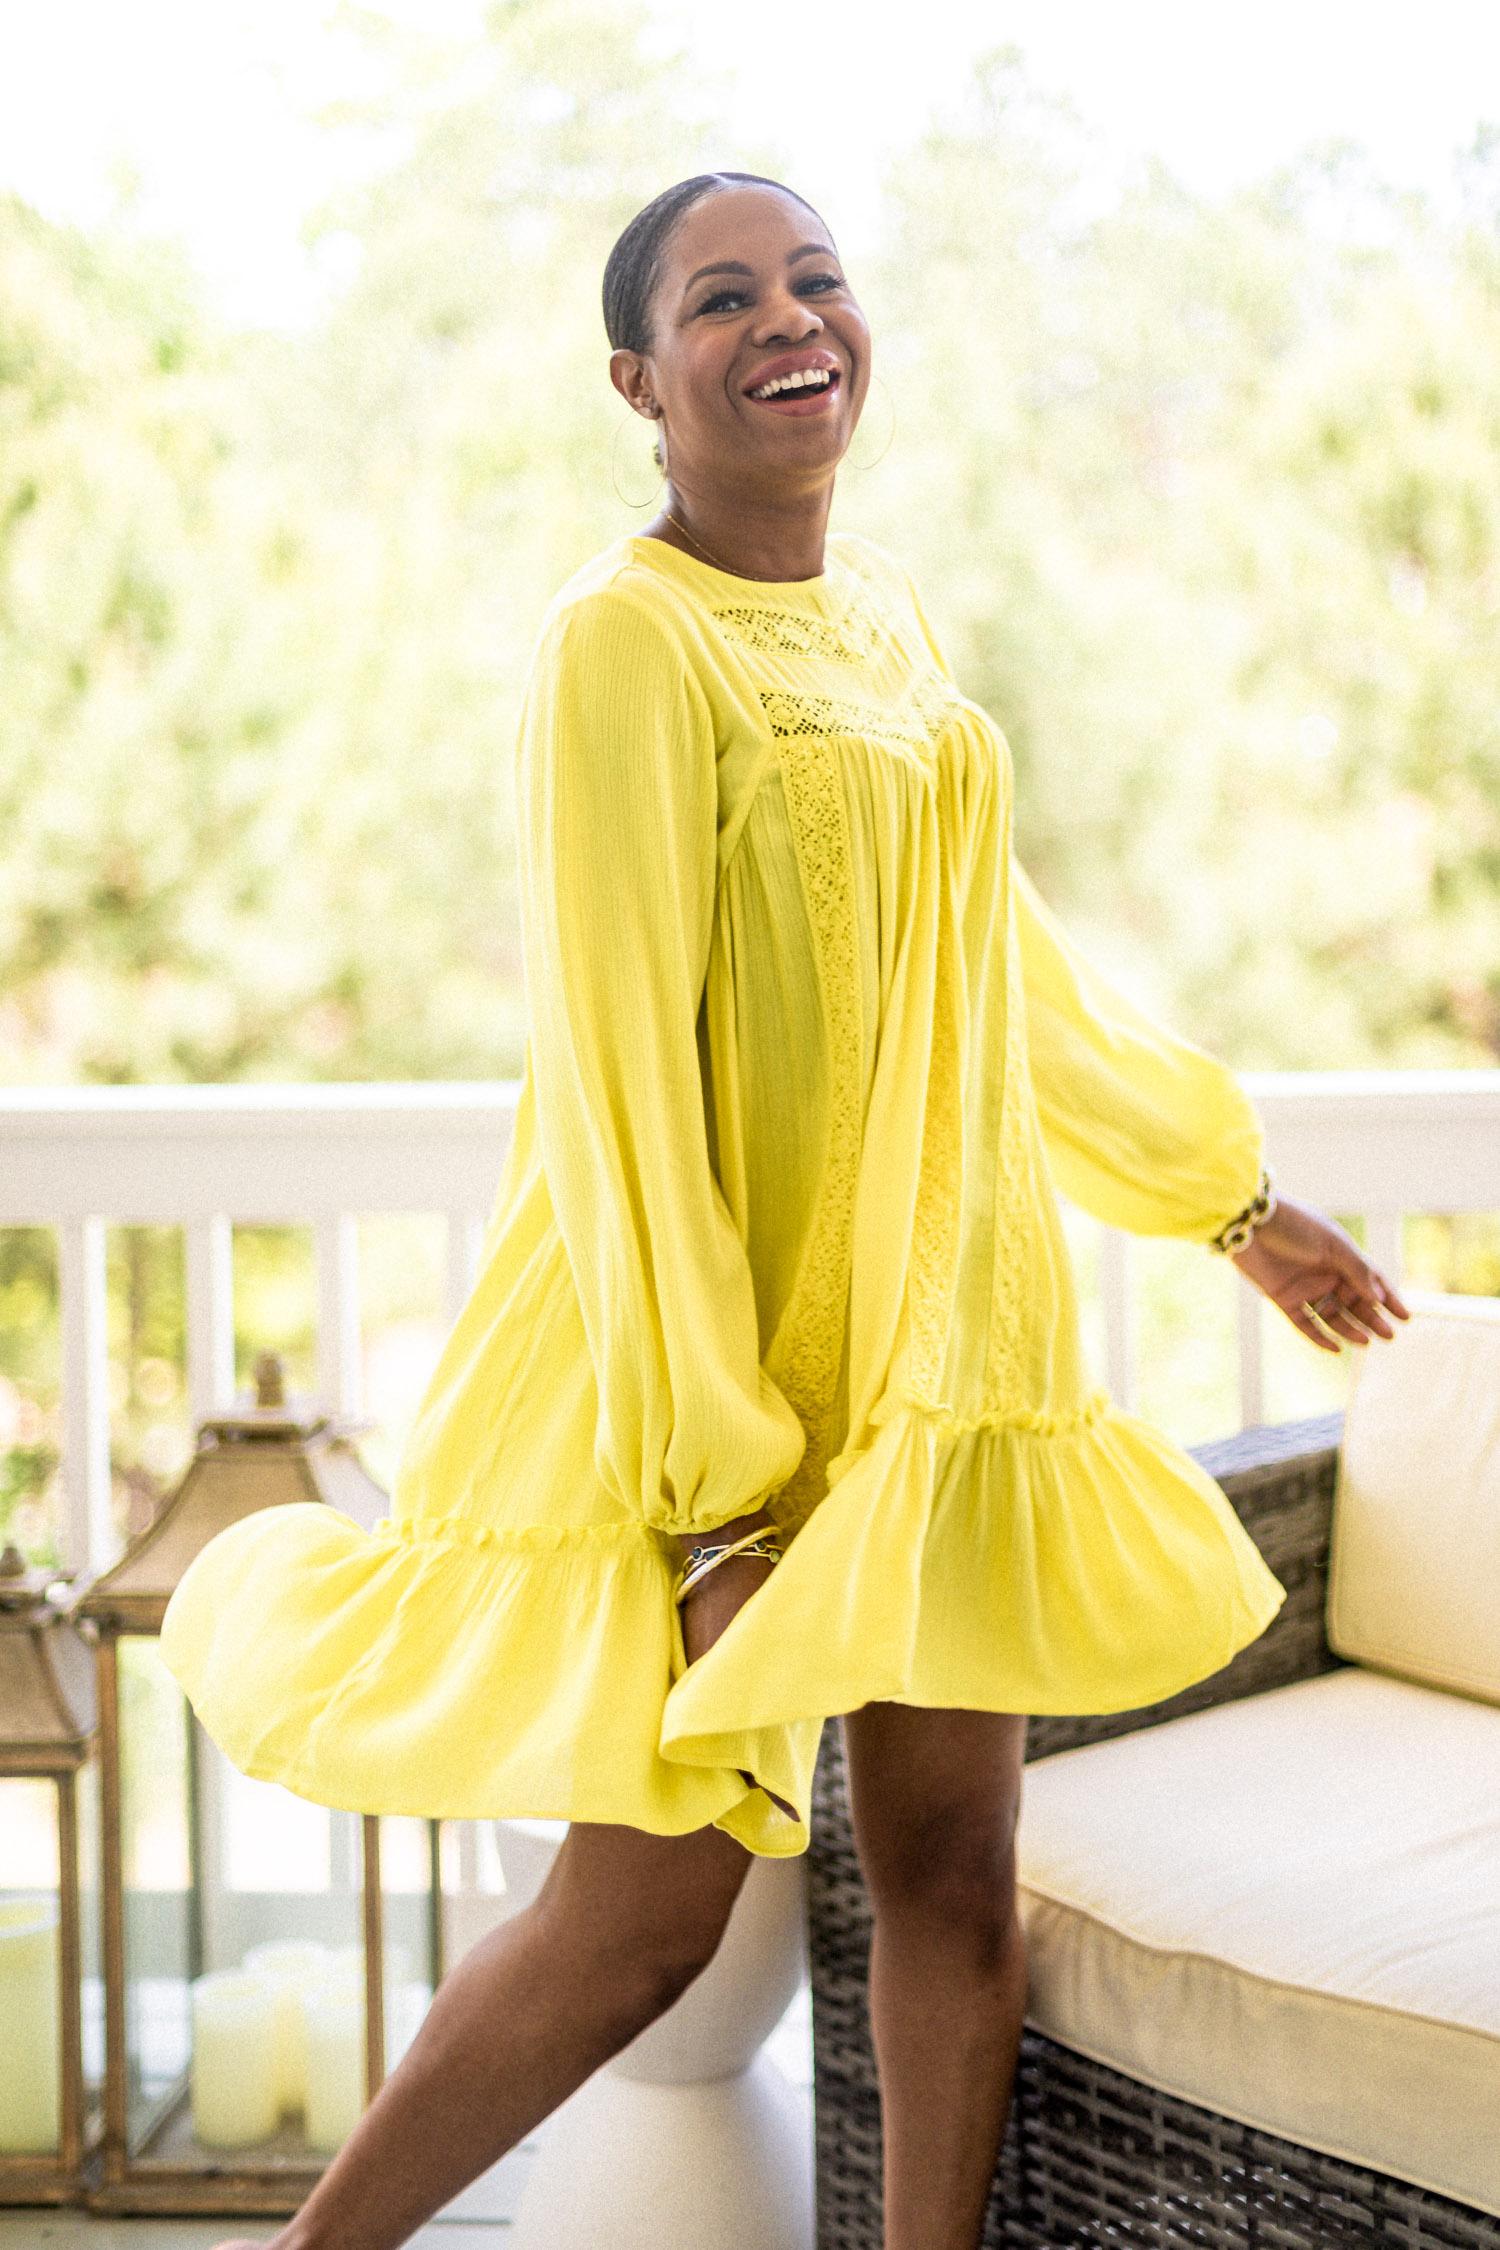 atlanta fashion blogger wearing yellow smock dress from walmart, yellow smock dress, summer dress, how to style a yellow dress, mini dress, yellow mini dress, spring dress, best dresses for spring